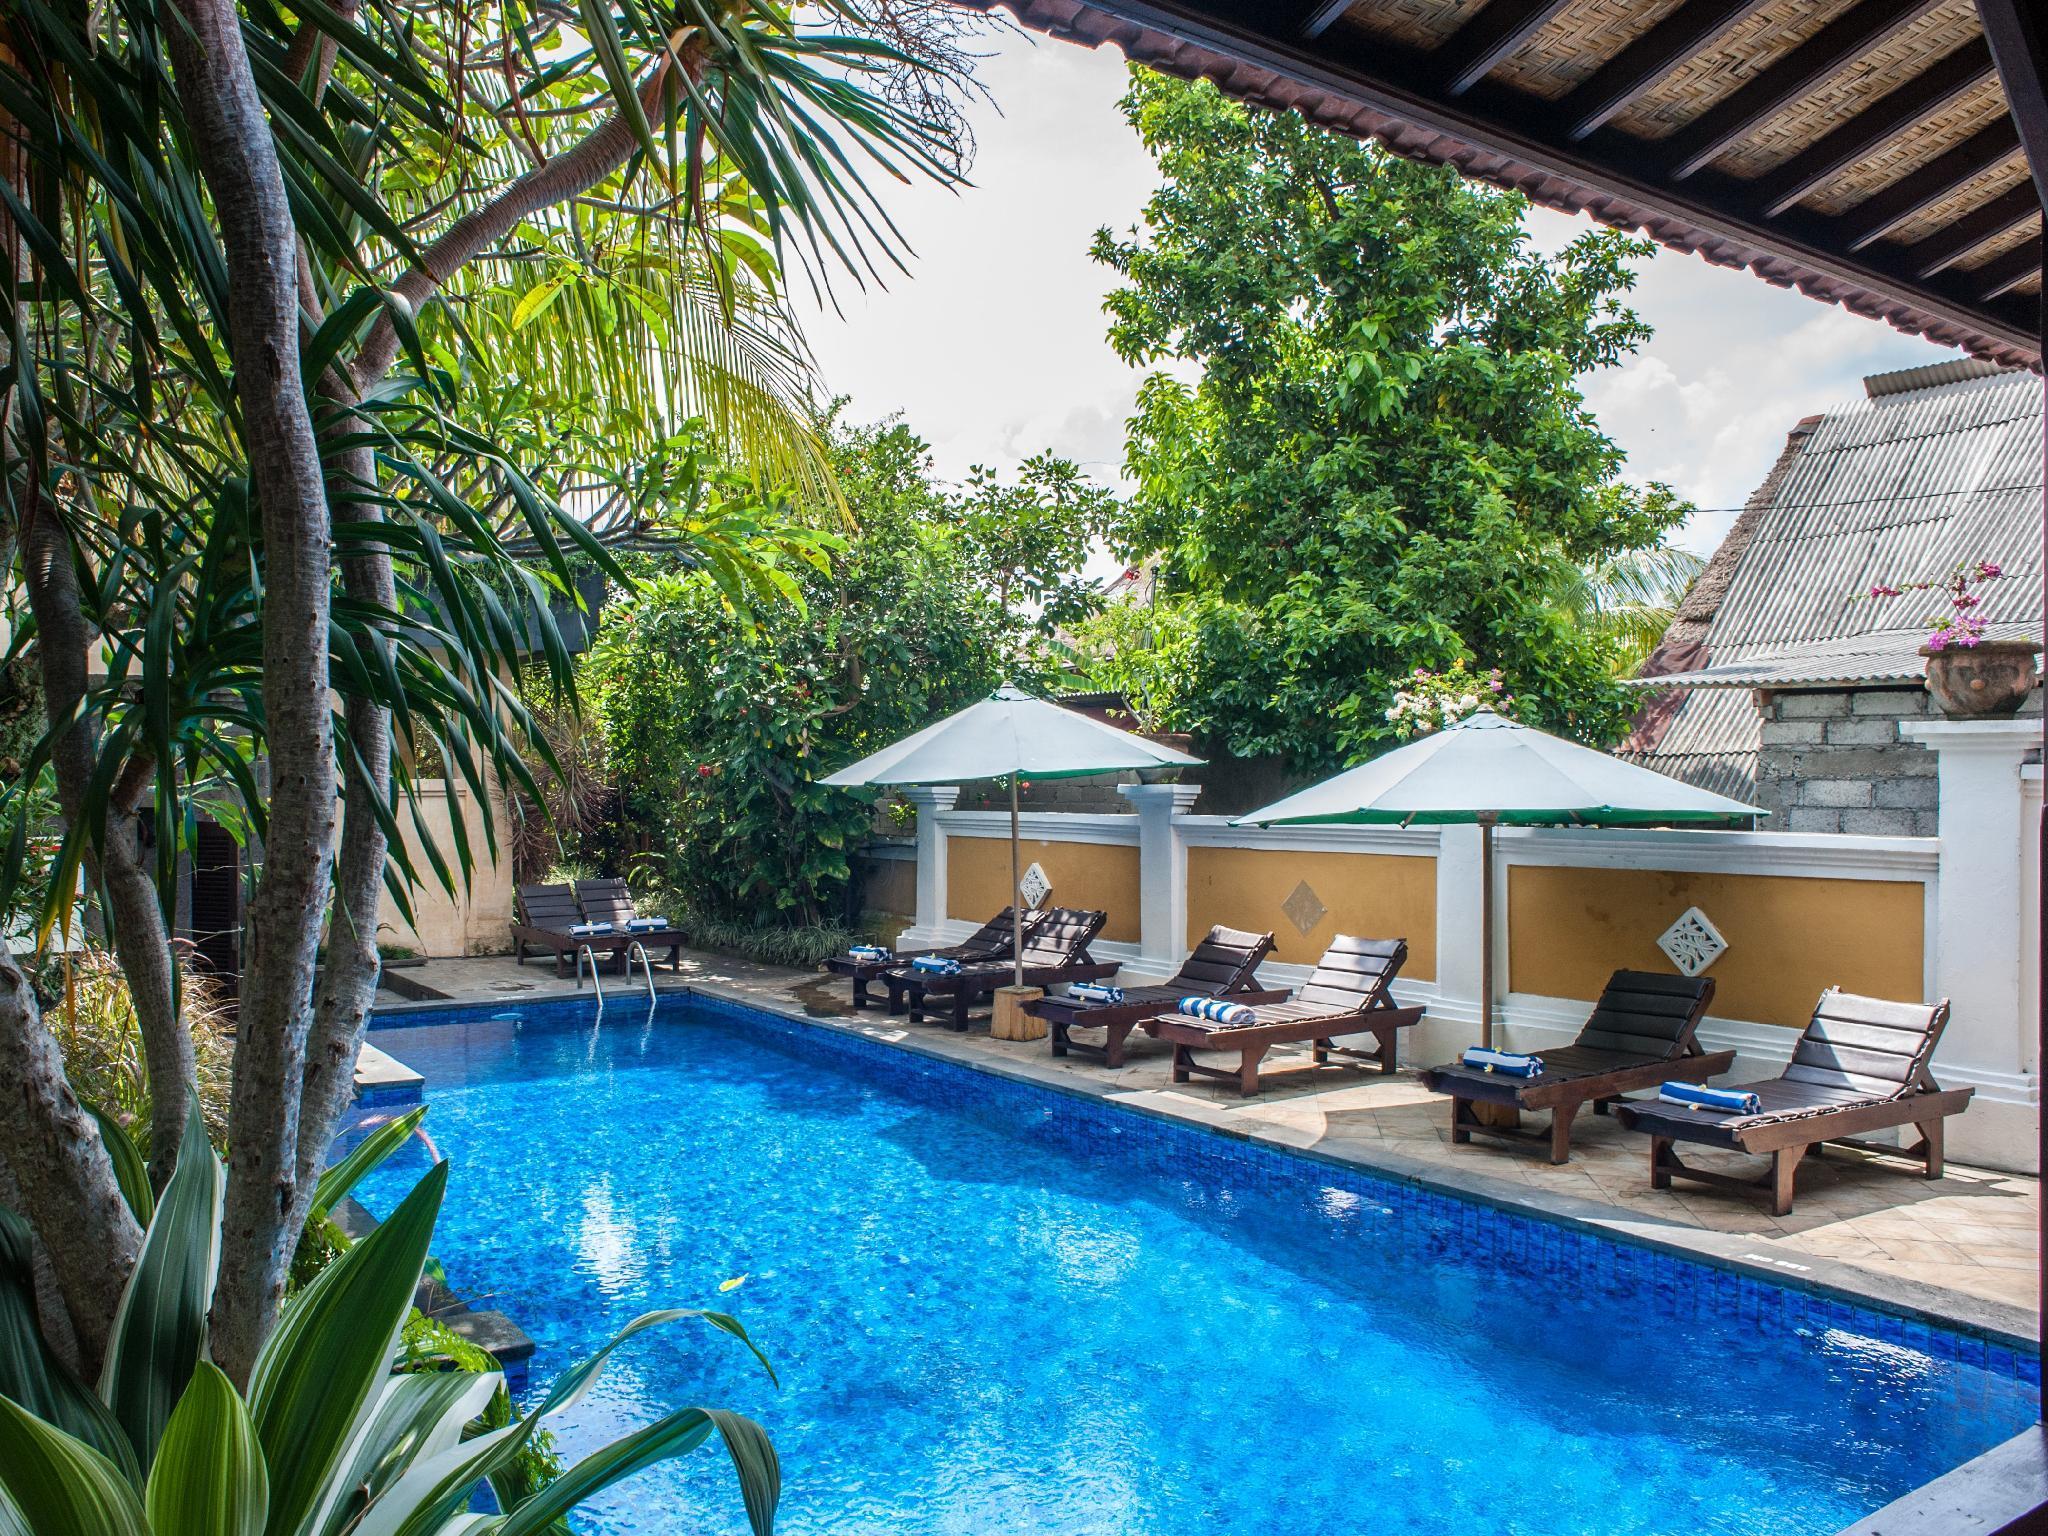 Inata Hotel Monkey Forest Ubud In Bali